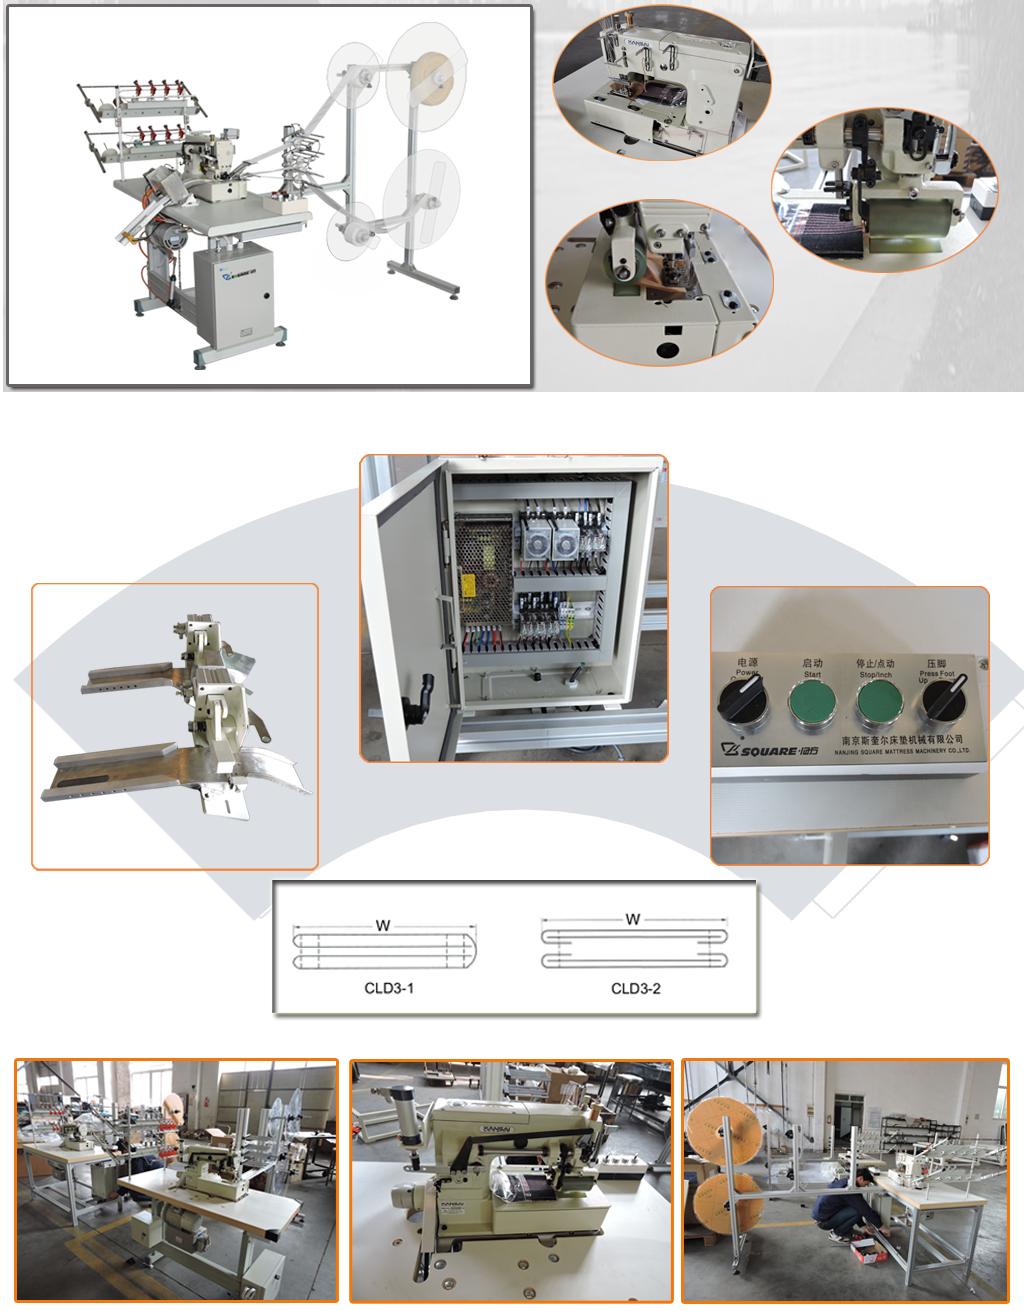 CLD3 mattress handle sewing/cutting machine details